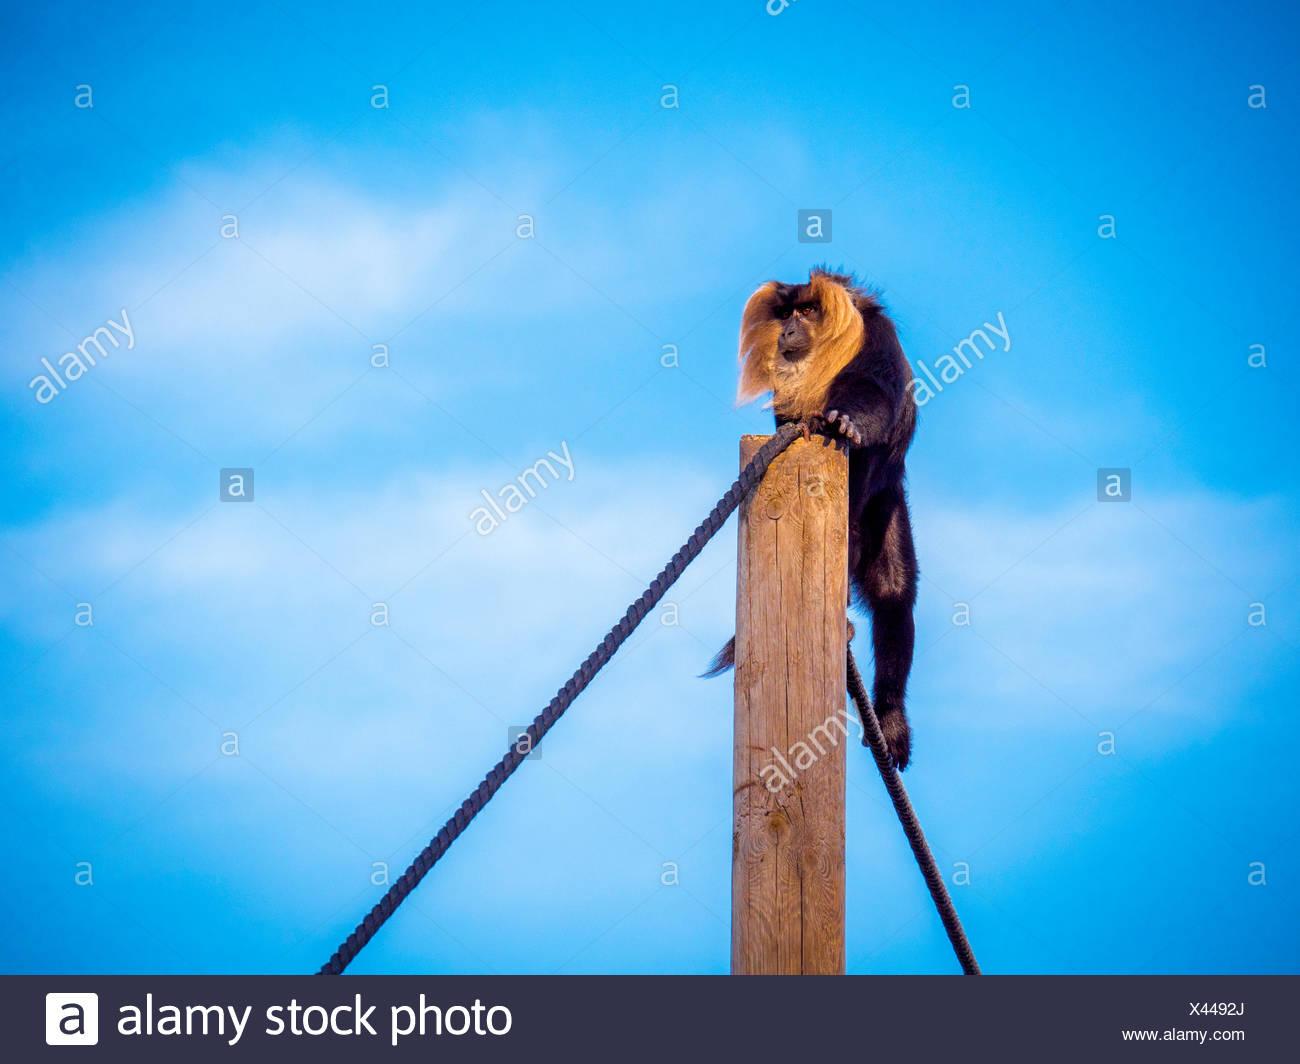 Monkey Climbing Wooden Post - Stock Image